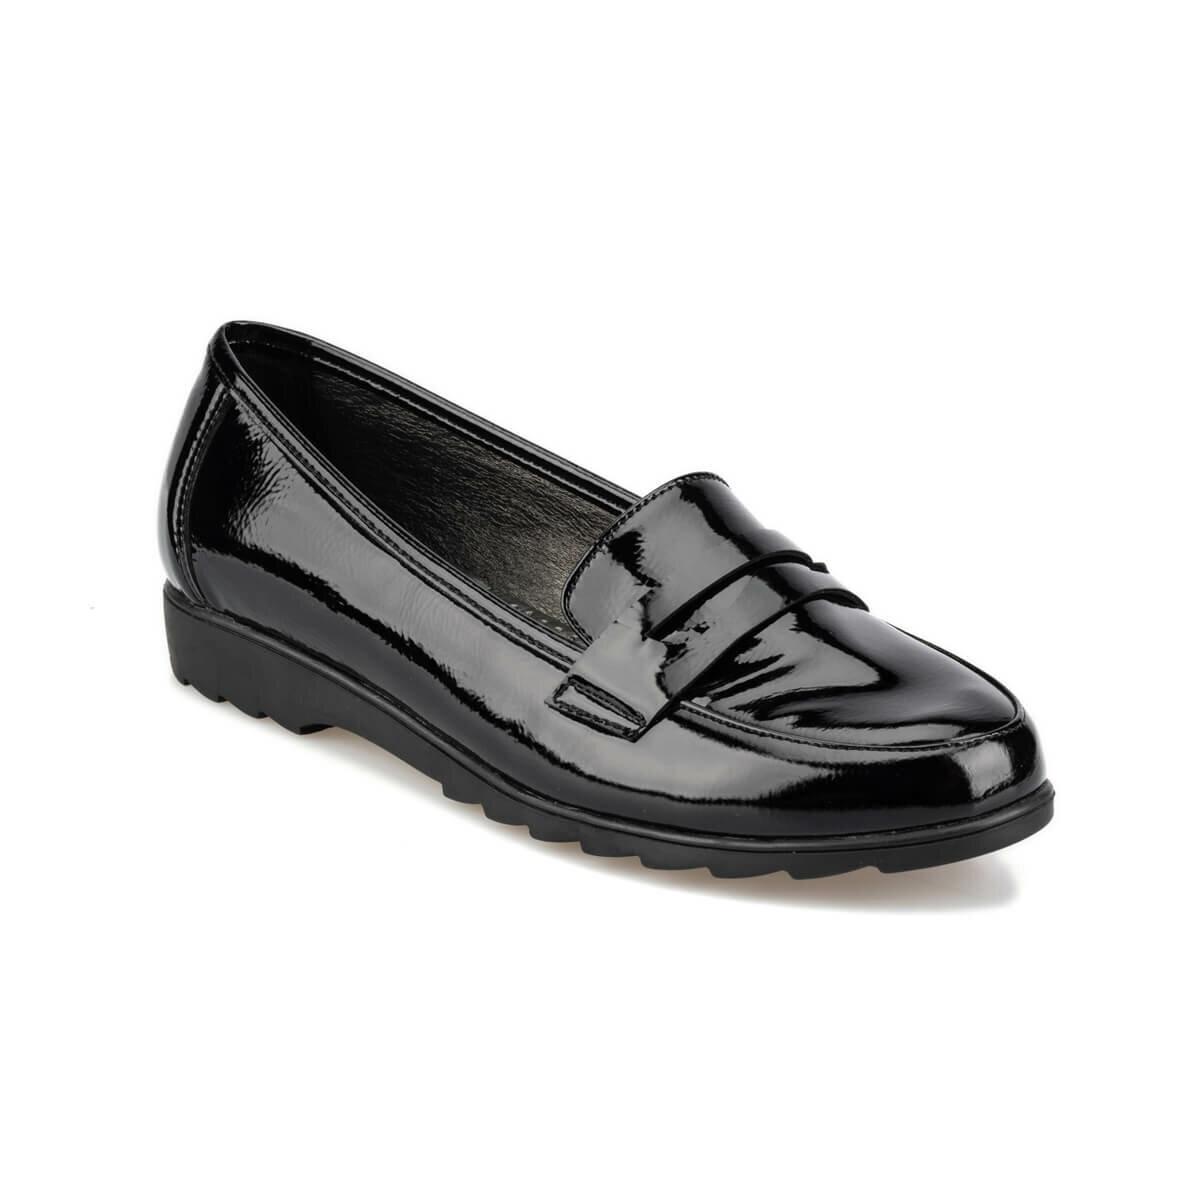 FLO 92.151006.Z Black Women Loafer Shoes Polaris